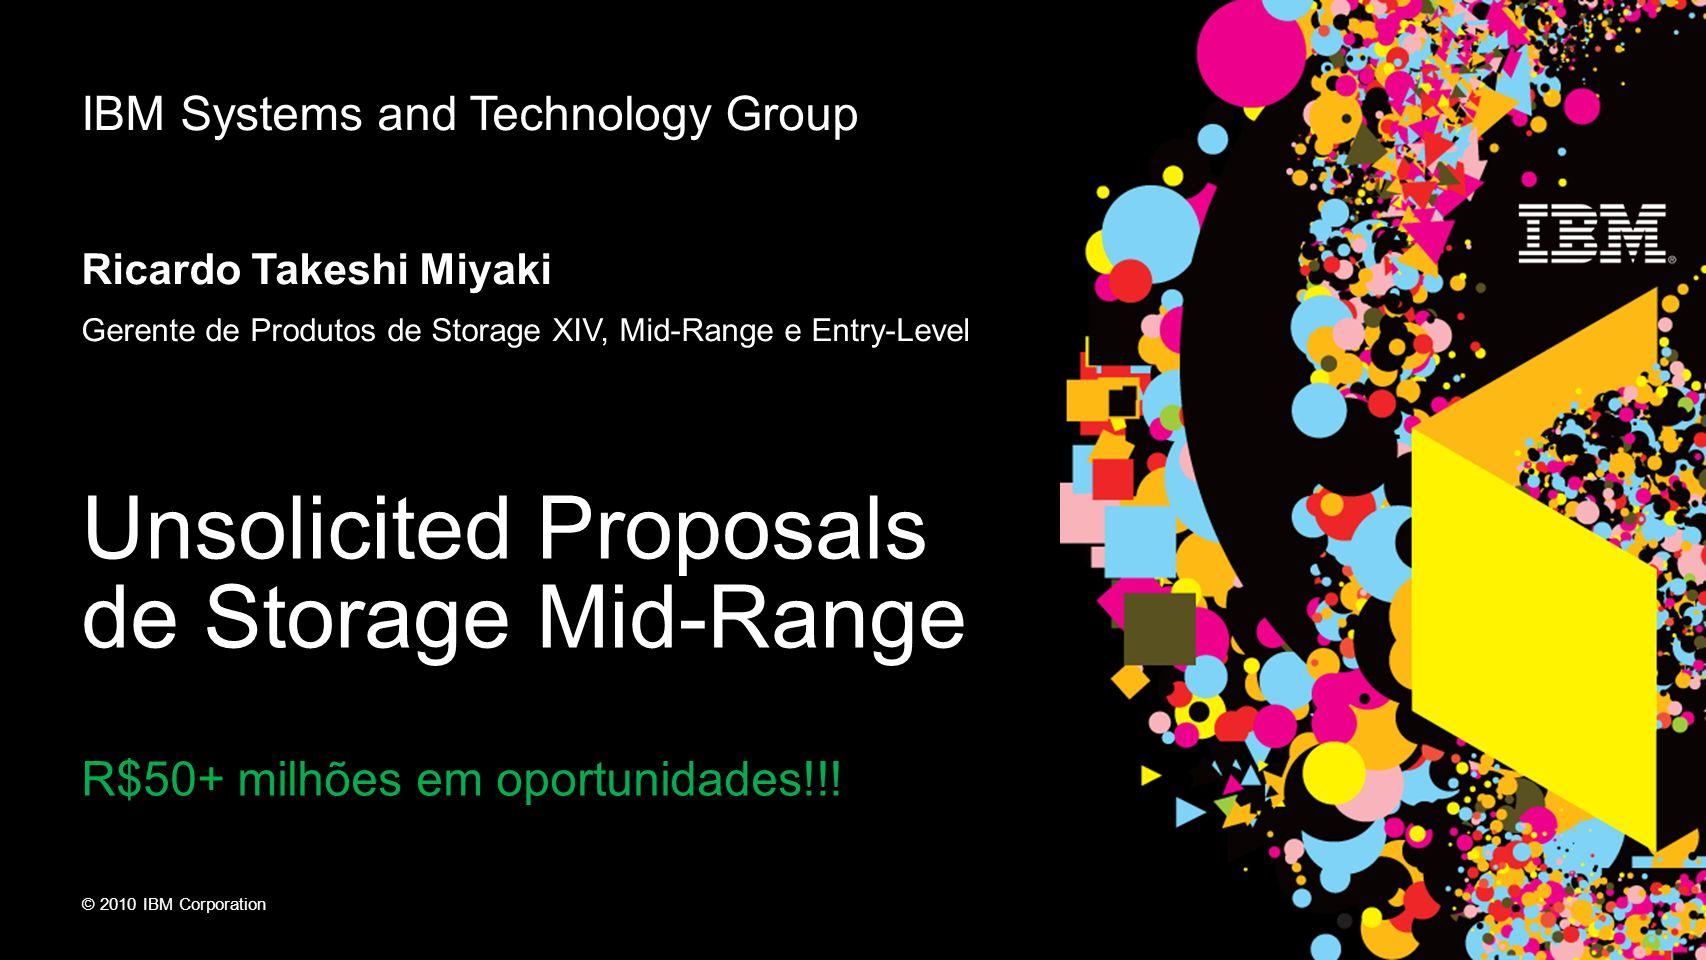 © 2010 IBM Corporation IBM Systems and Technology Group Ricardo Takeshi Miyaki Gerente de Produtos de Storage XIV, Mid-Range e Entry-Level Unsolicited